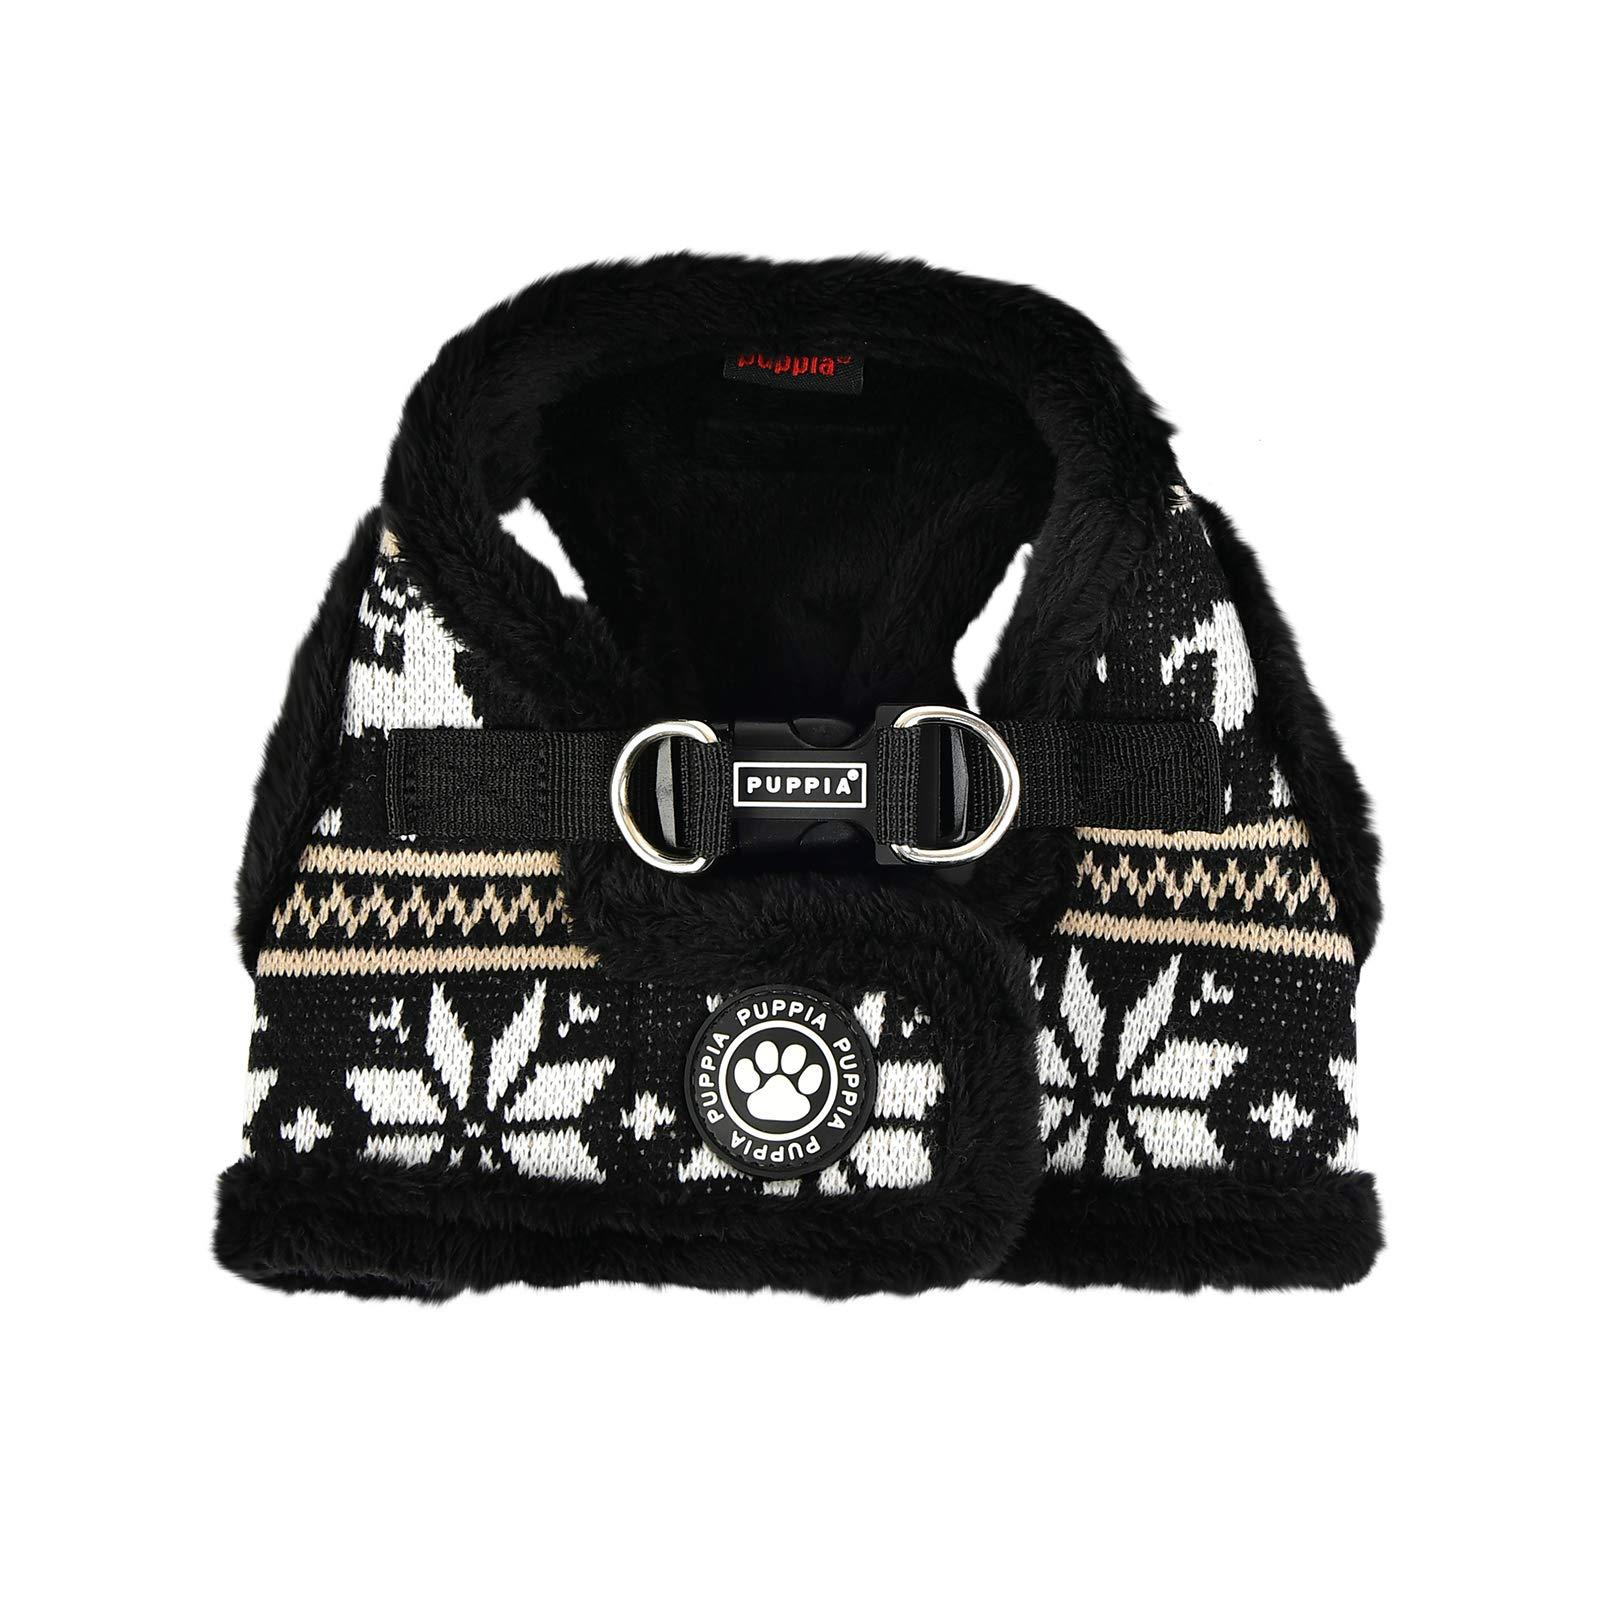 Puppia Prancer Harness B - Black - S by Puppia